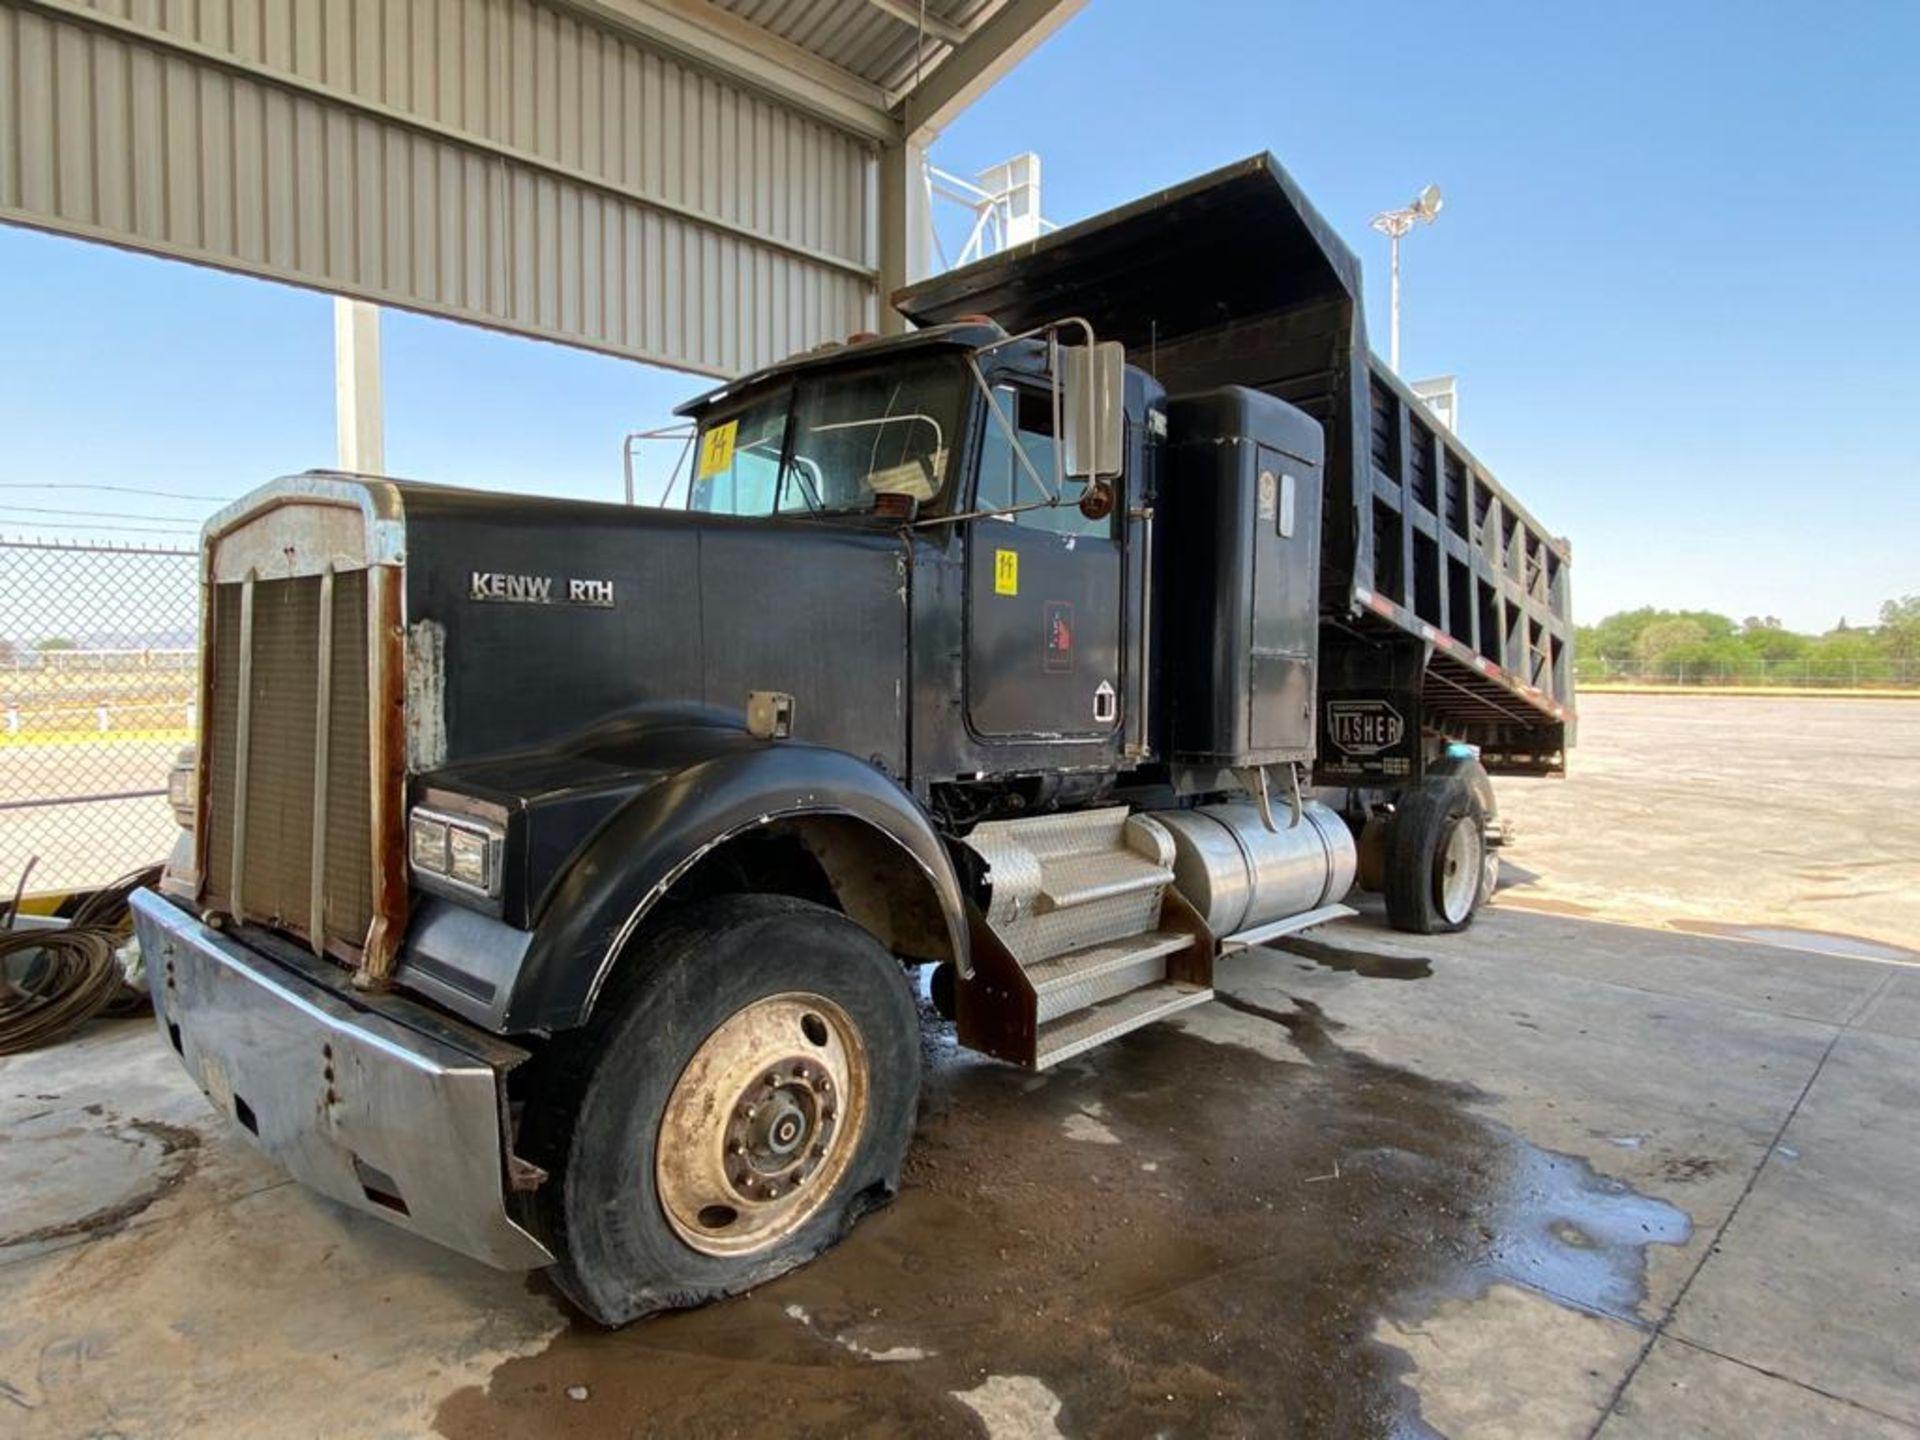 1983 Kenworth Dump Truck, standard transmission of 10 speeds, with Cummins motor - Image 6 of 68